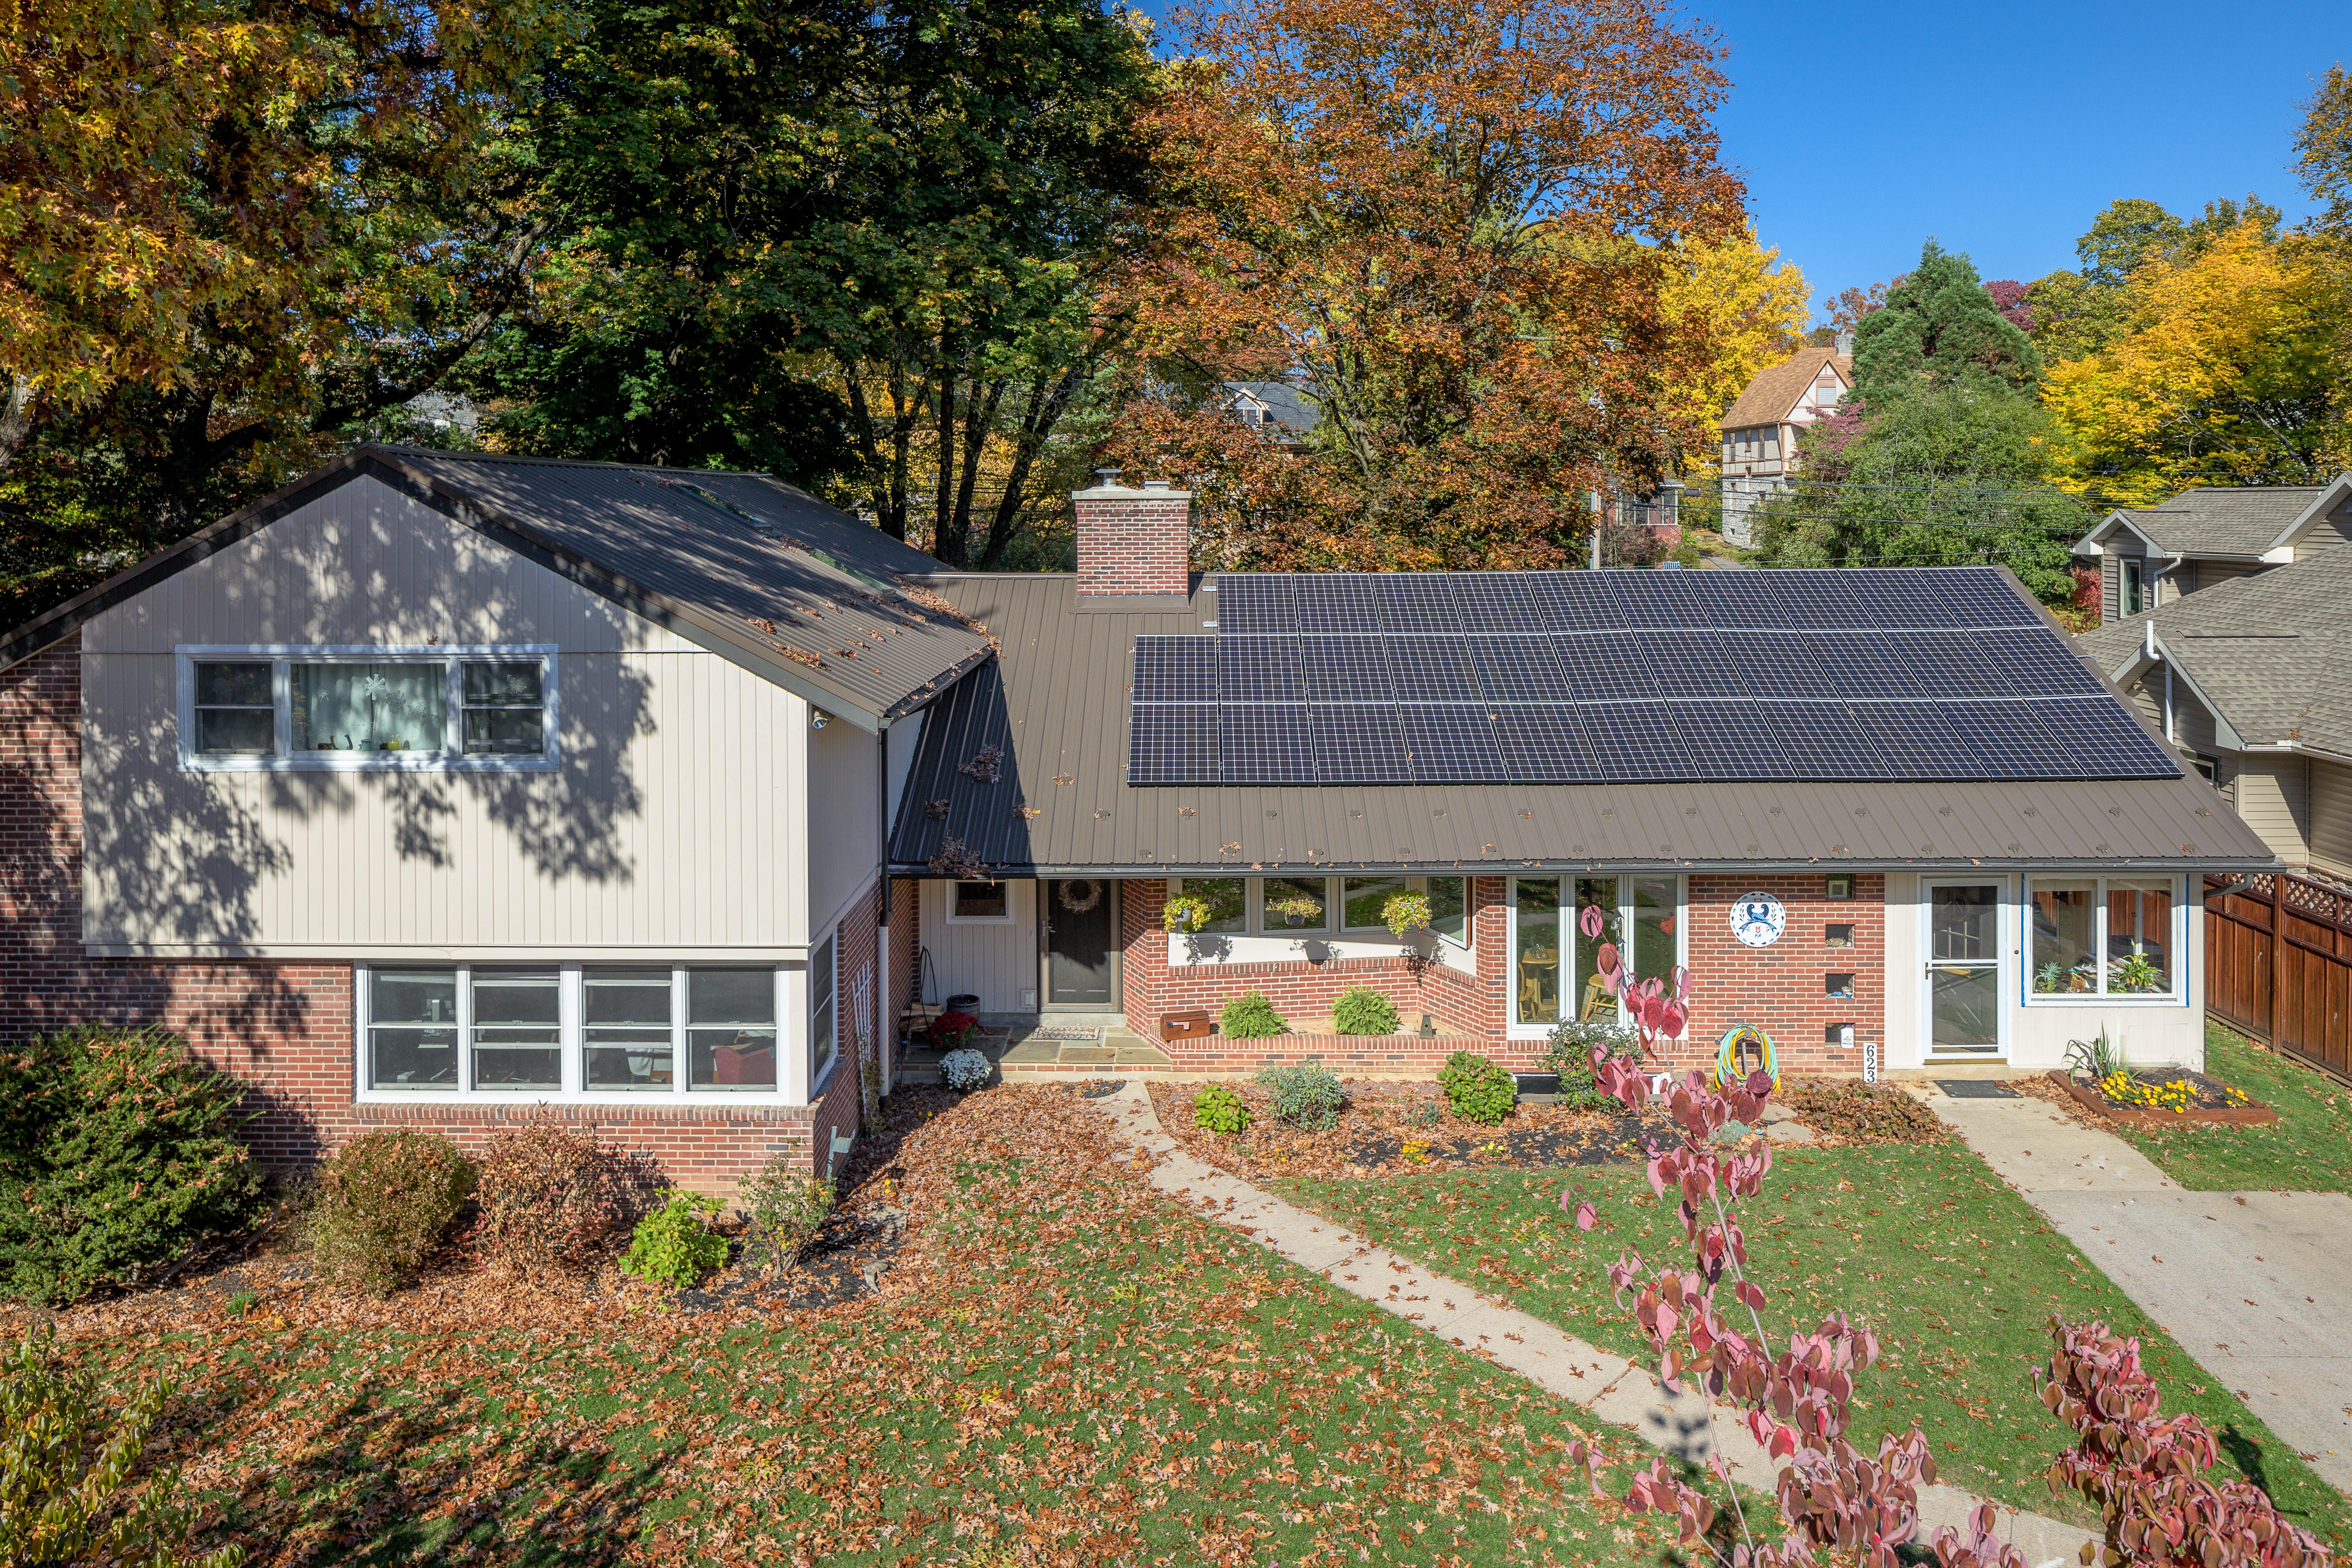 Misangyi Residential Solar Panels